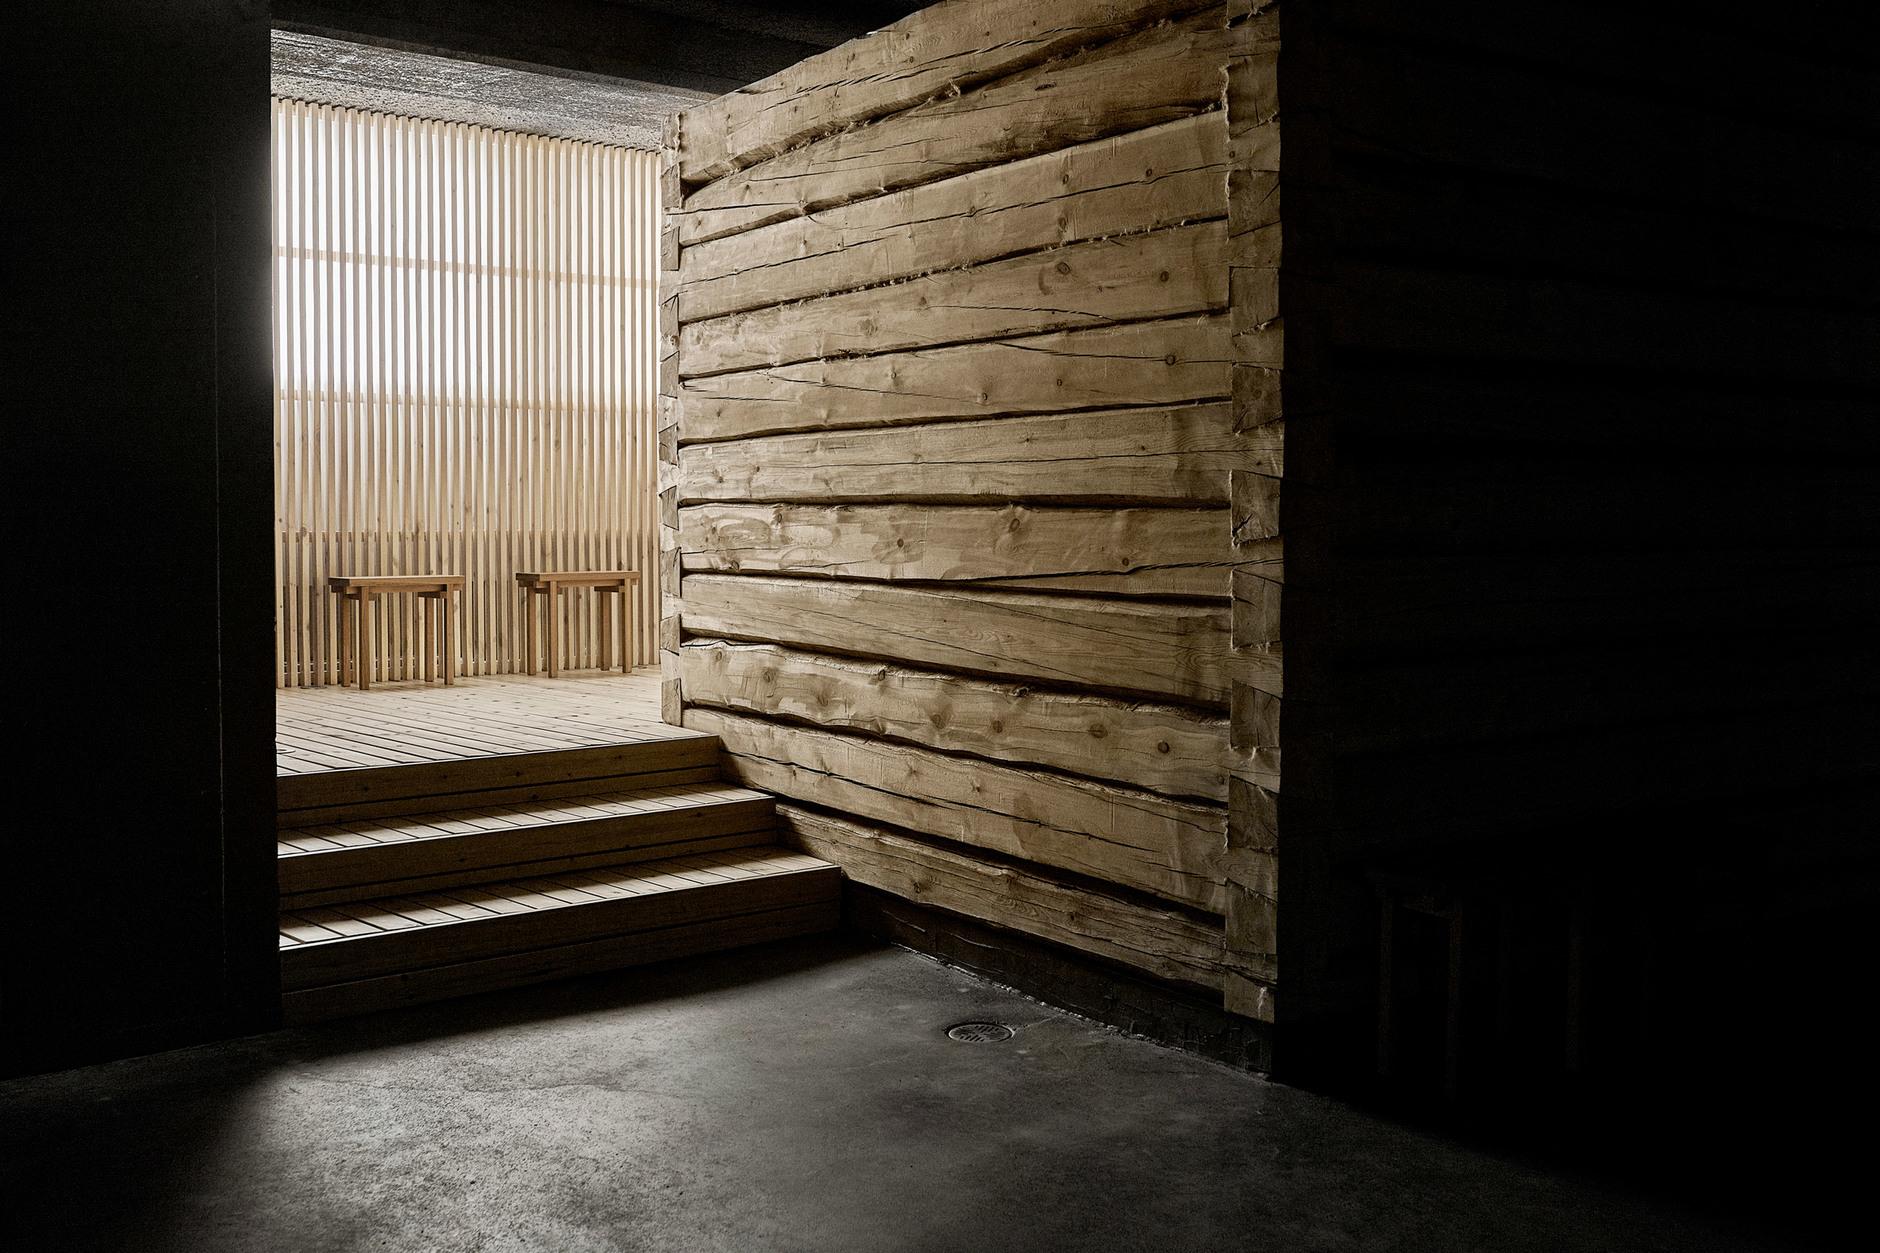 Дуб, бетон и скандинавский дизайн: сауна по проекту Studio Puisto (галерея 4, фото 4)